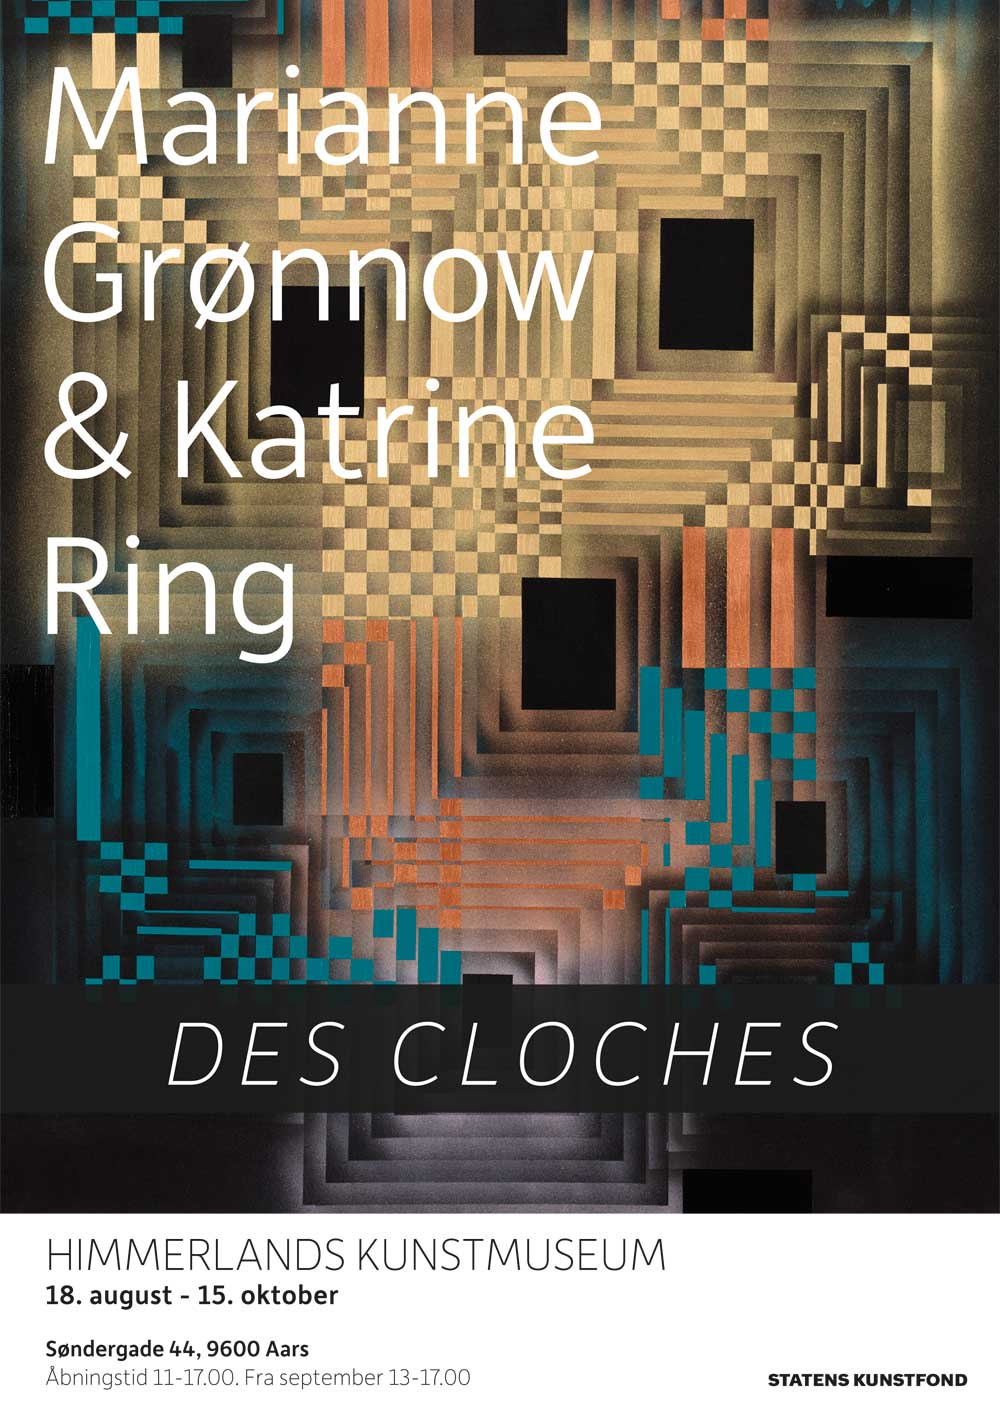 Plakat fra udstilling med Marianne Grønnow og Katrine Ring